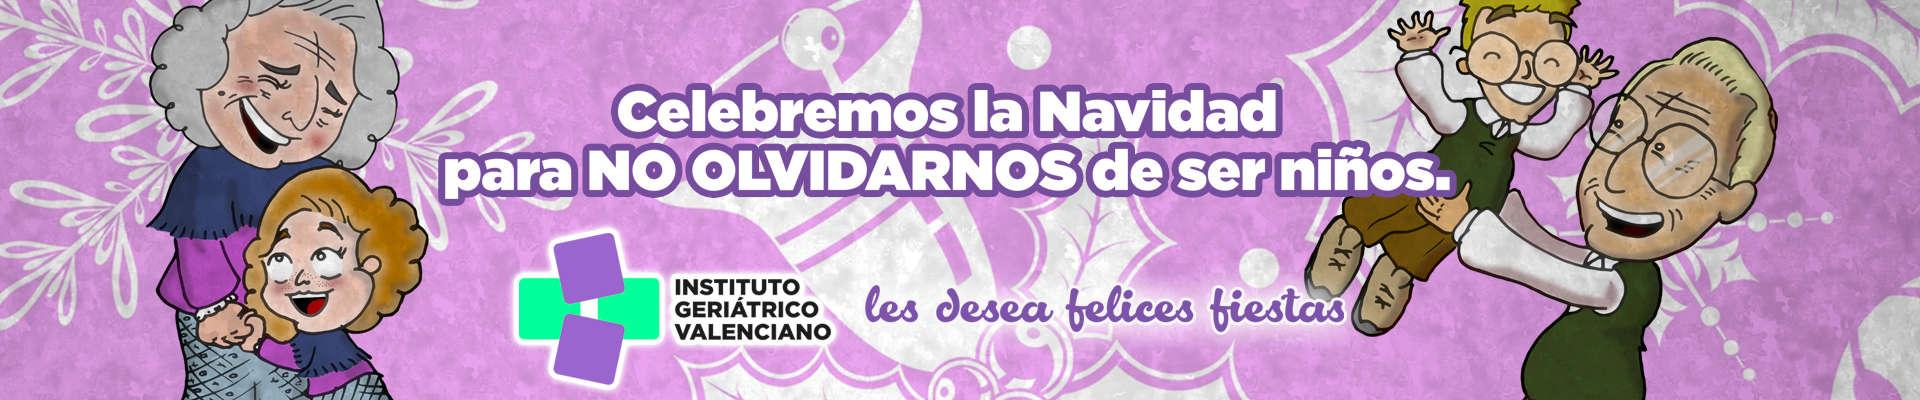 Postal-Navideña-Instituto-Geriátrico-Valenciano-bannerWEB